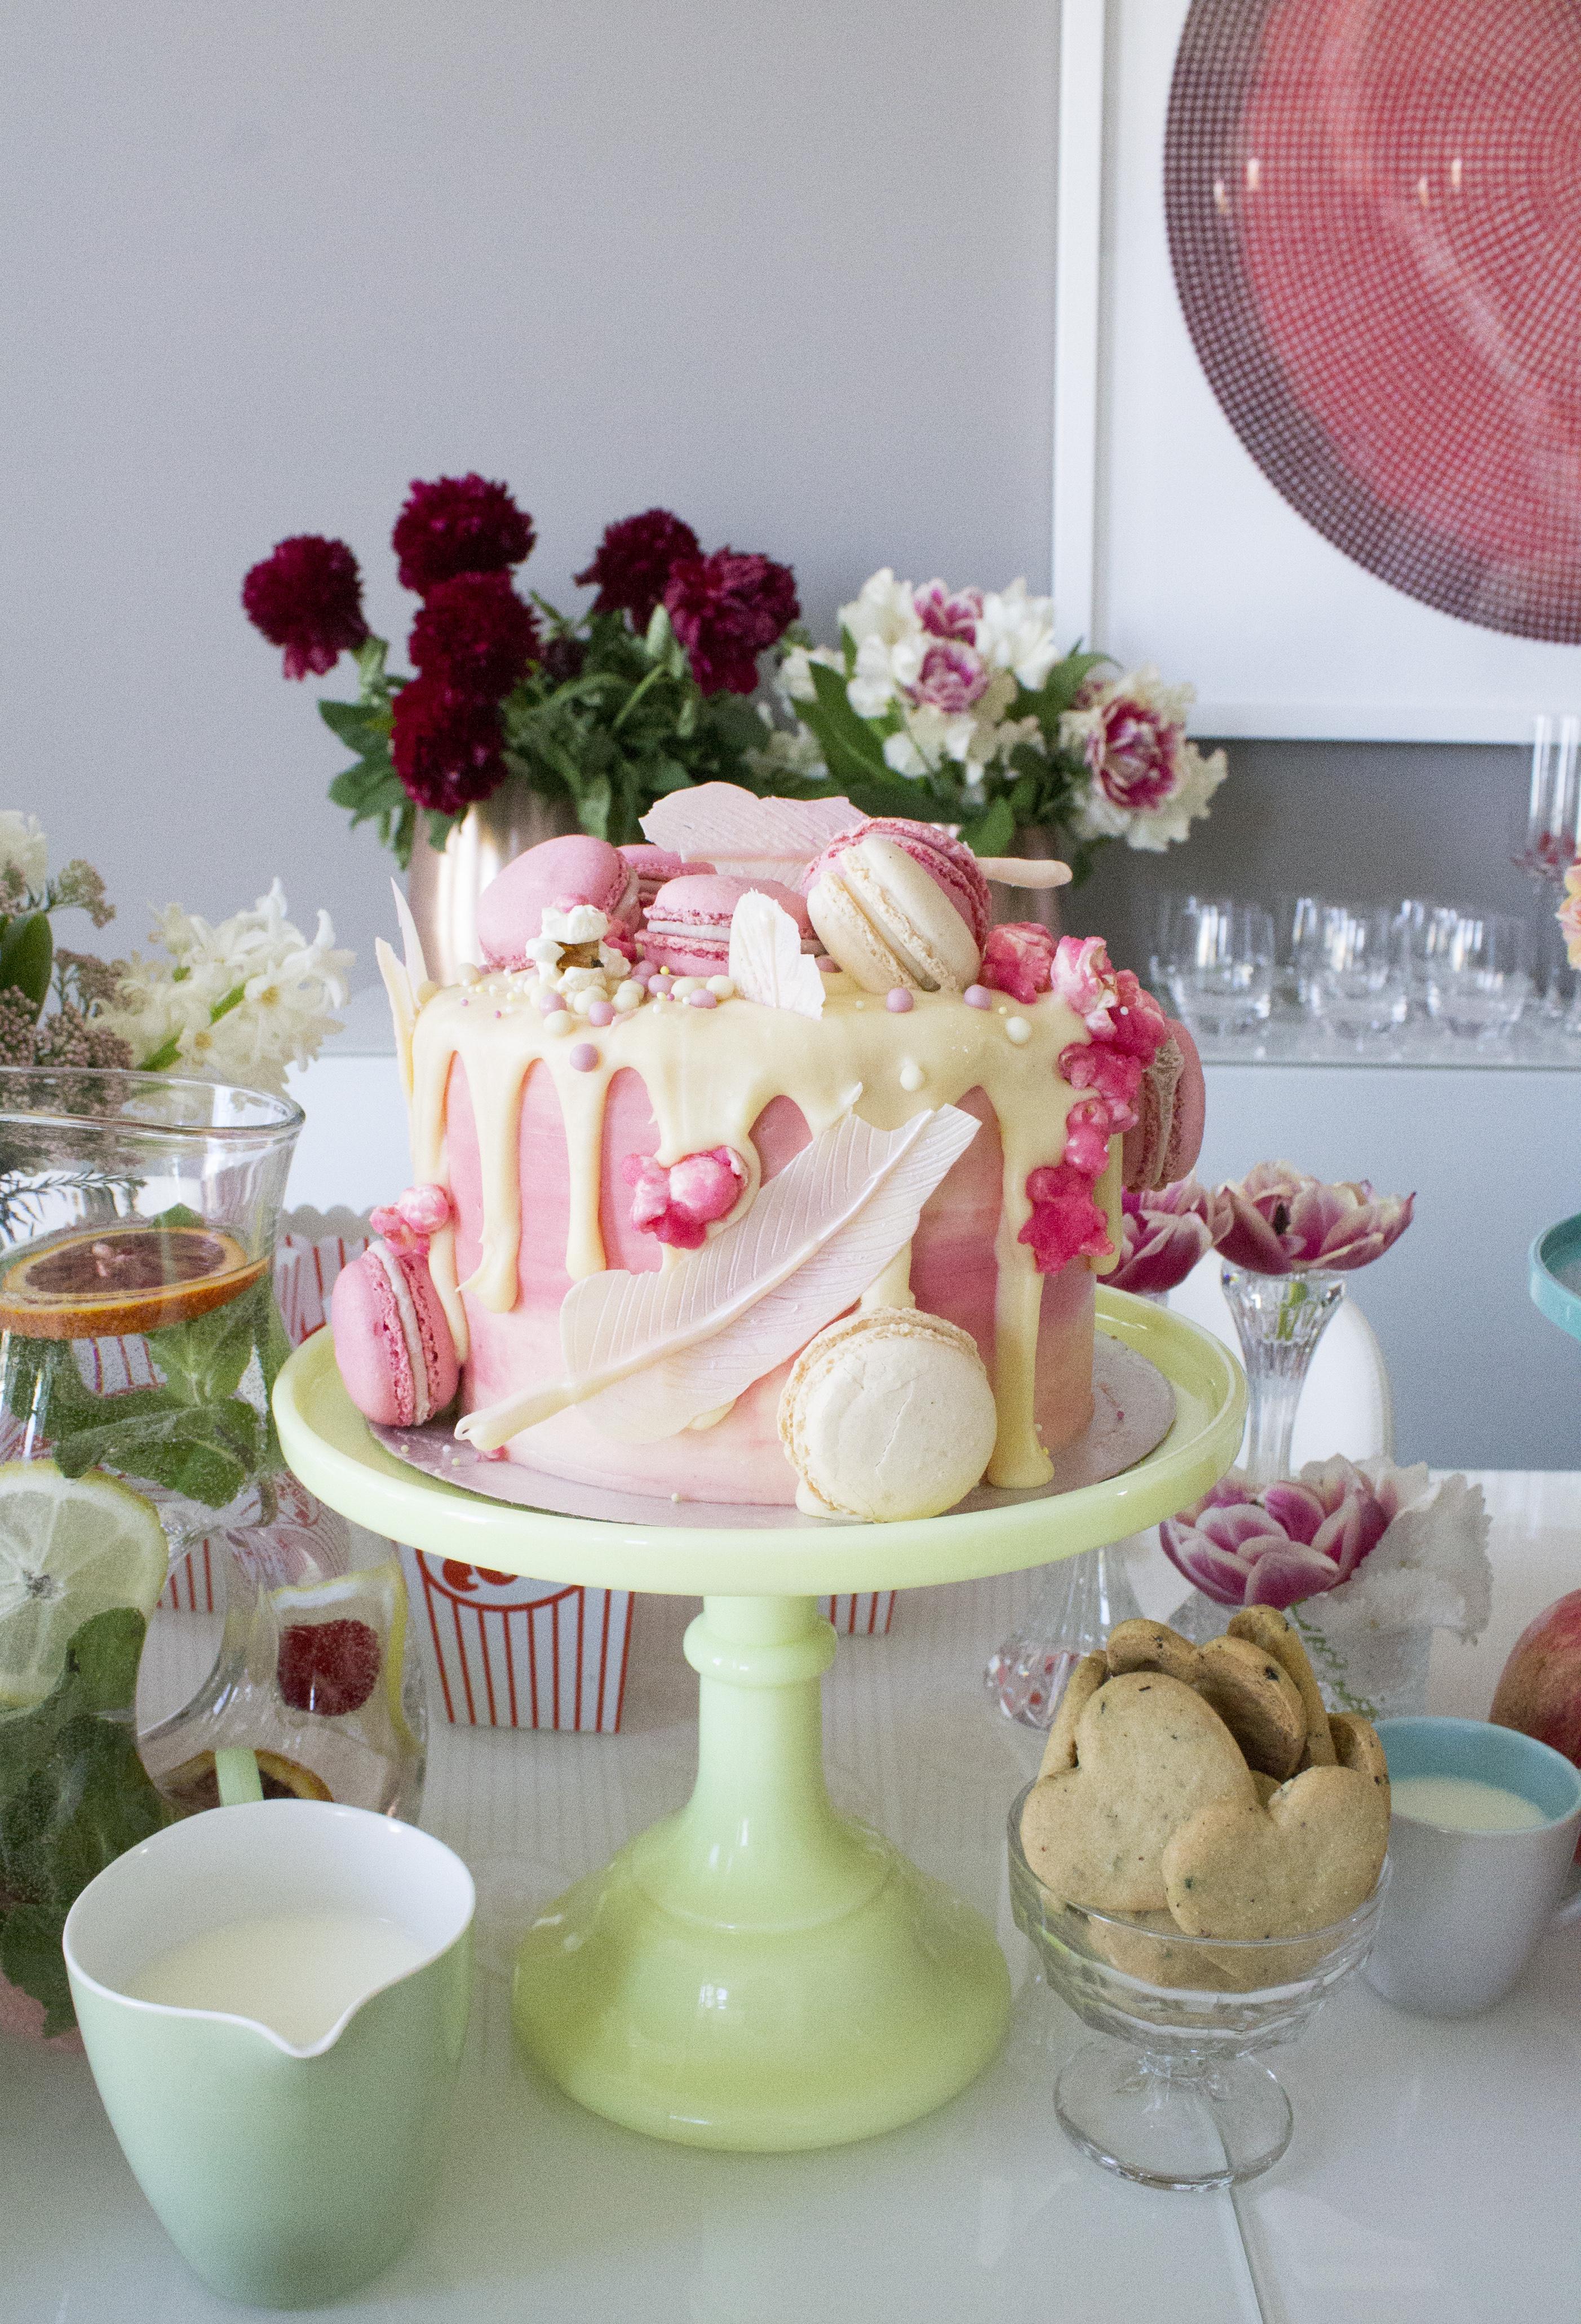 Flamingo-cake-by-Anges-de-Sucre-Little-Big-Bell